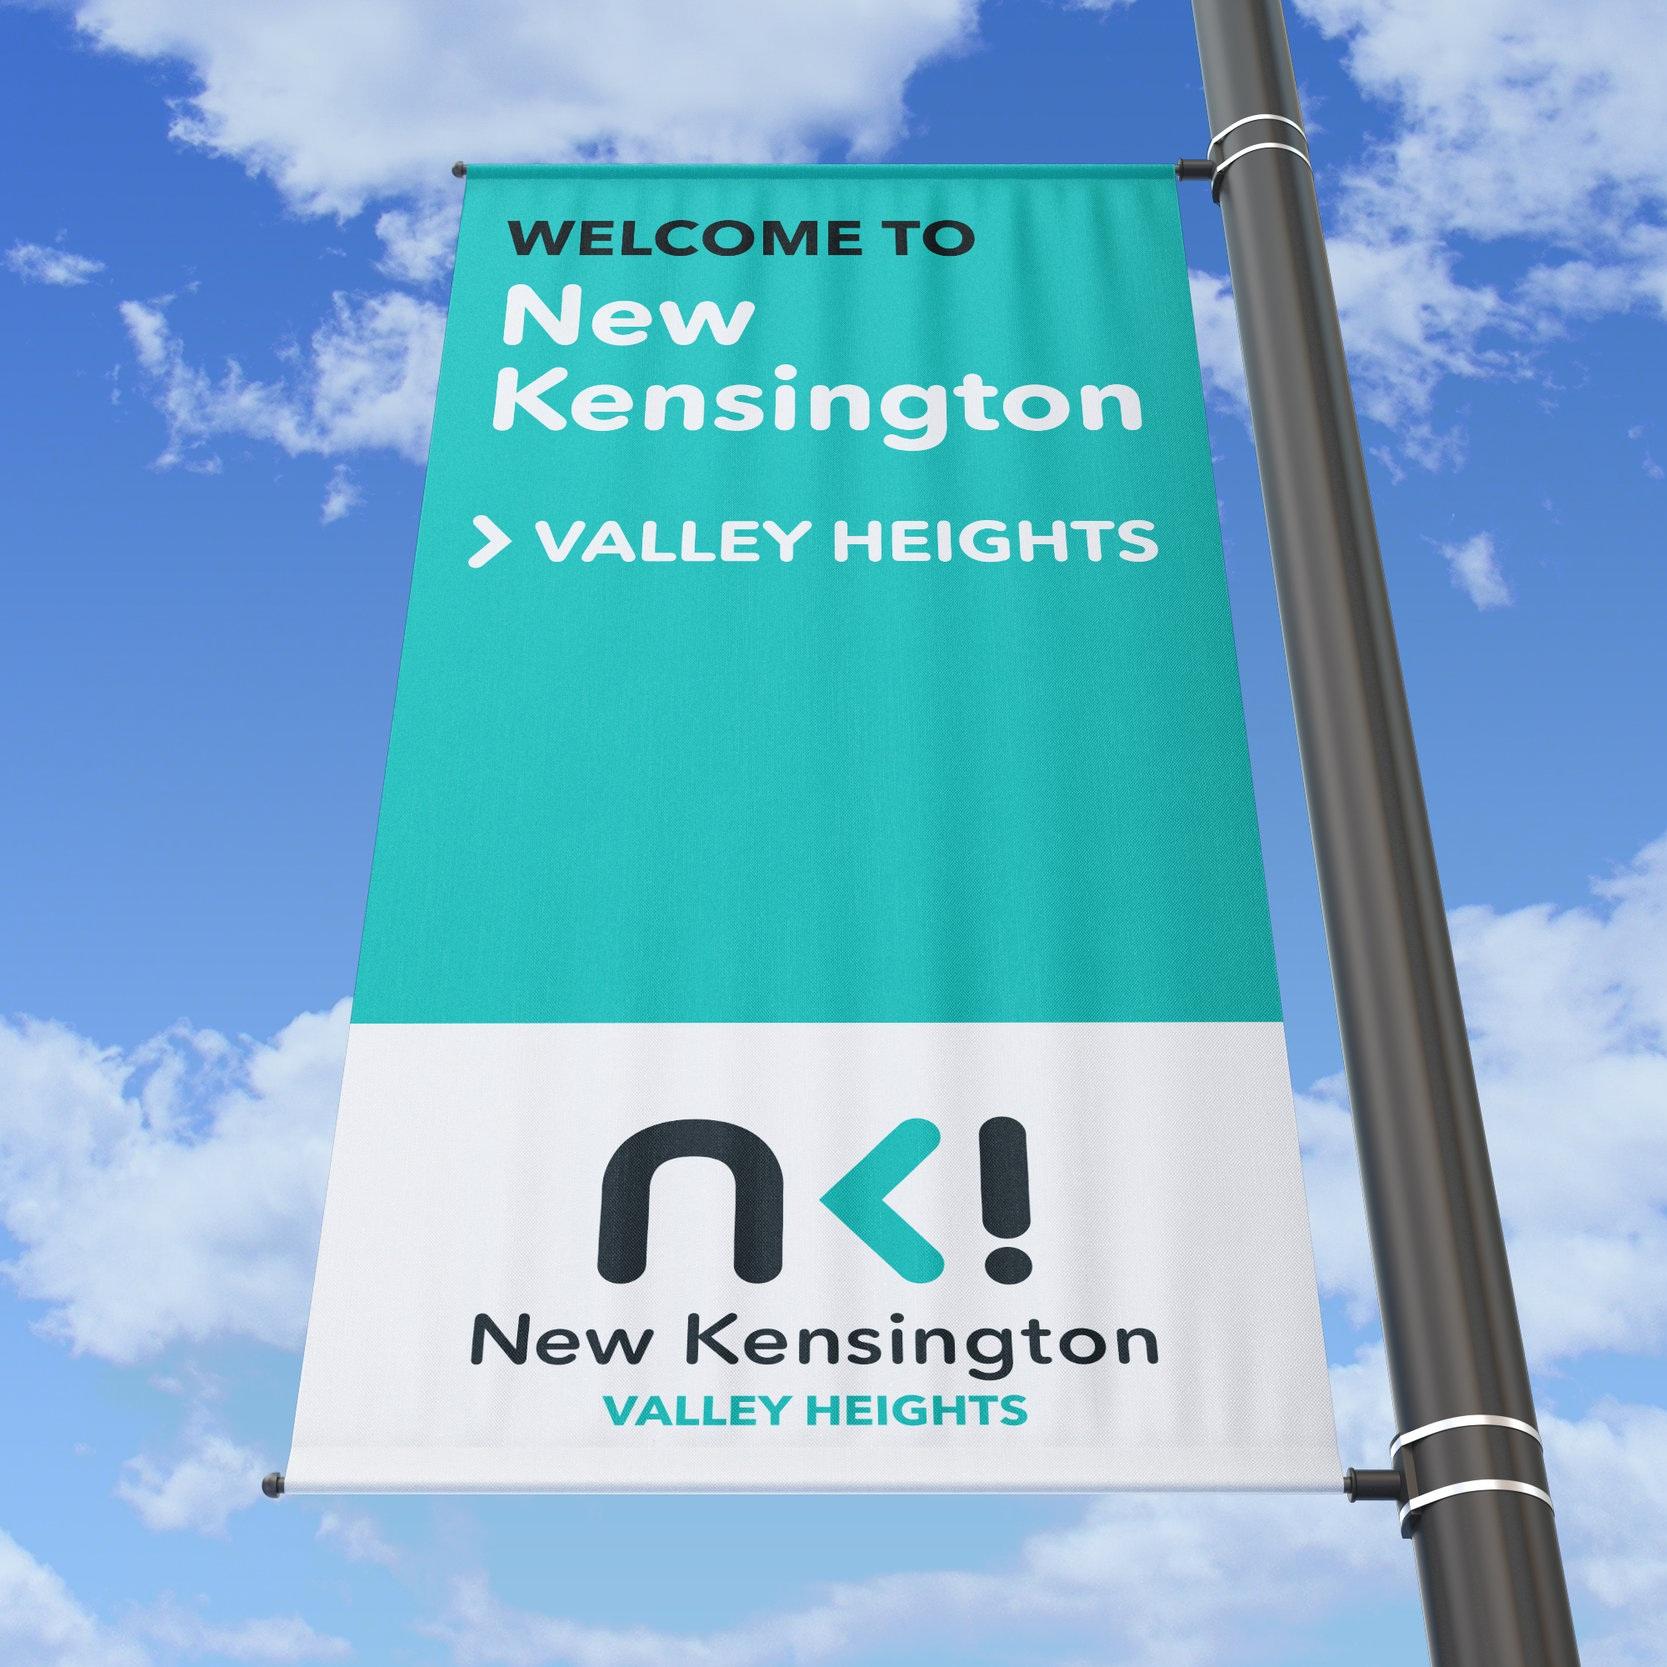 NewKen_Welcome_Poster_Concept1_ValleyHeights.jpg